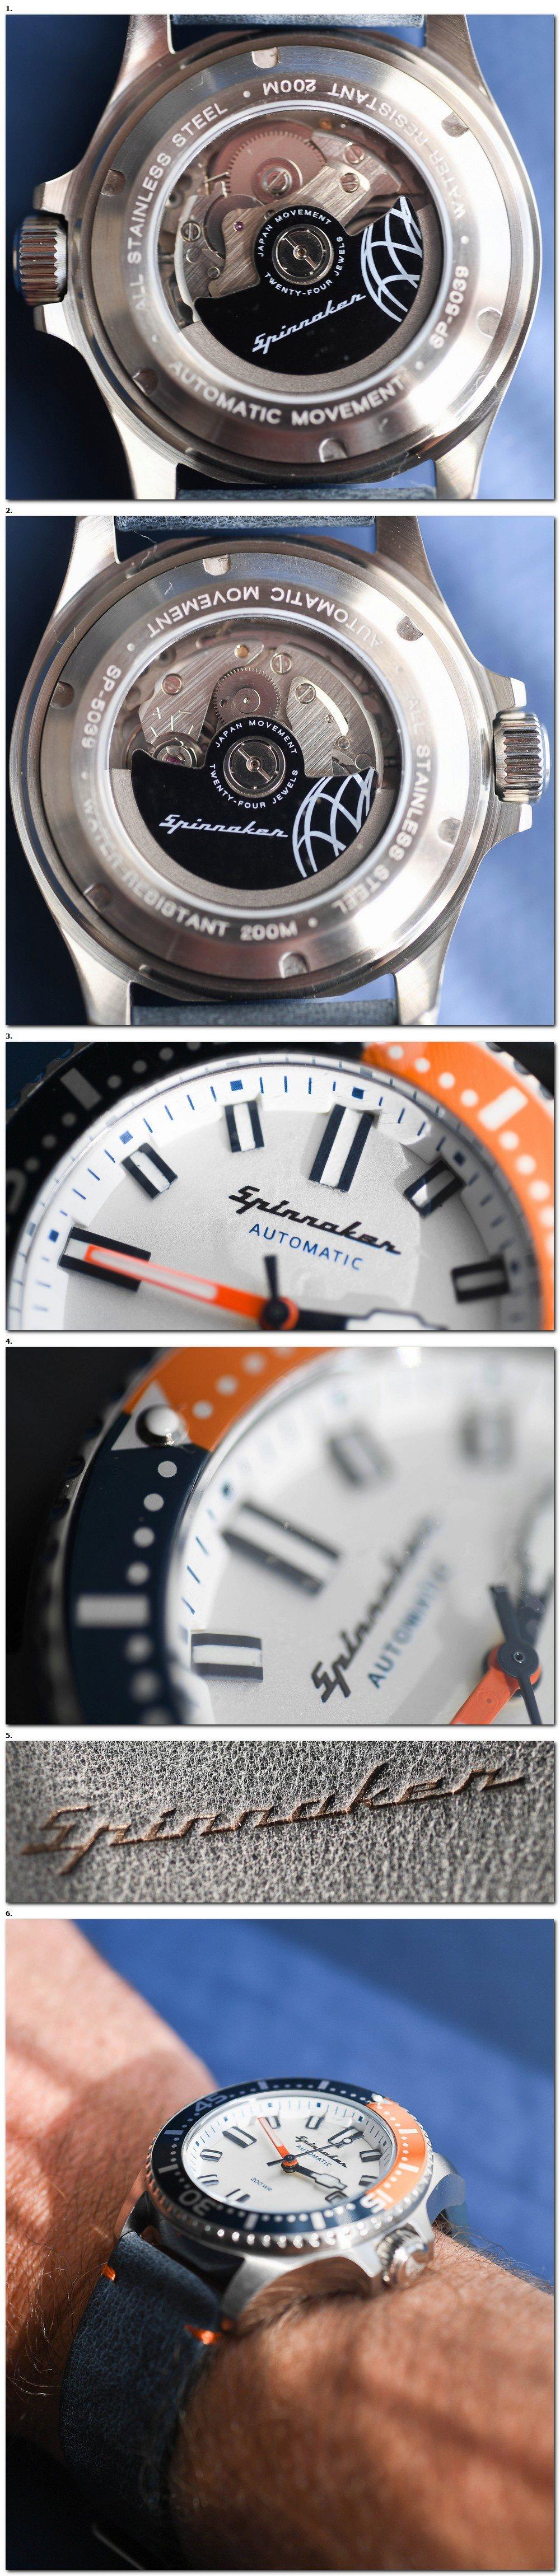 Les montres Spinnaker de Dartmouth Brands / Solar time limited – Hong Kong. 2018-015